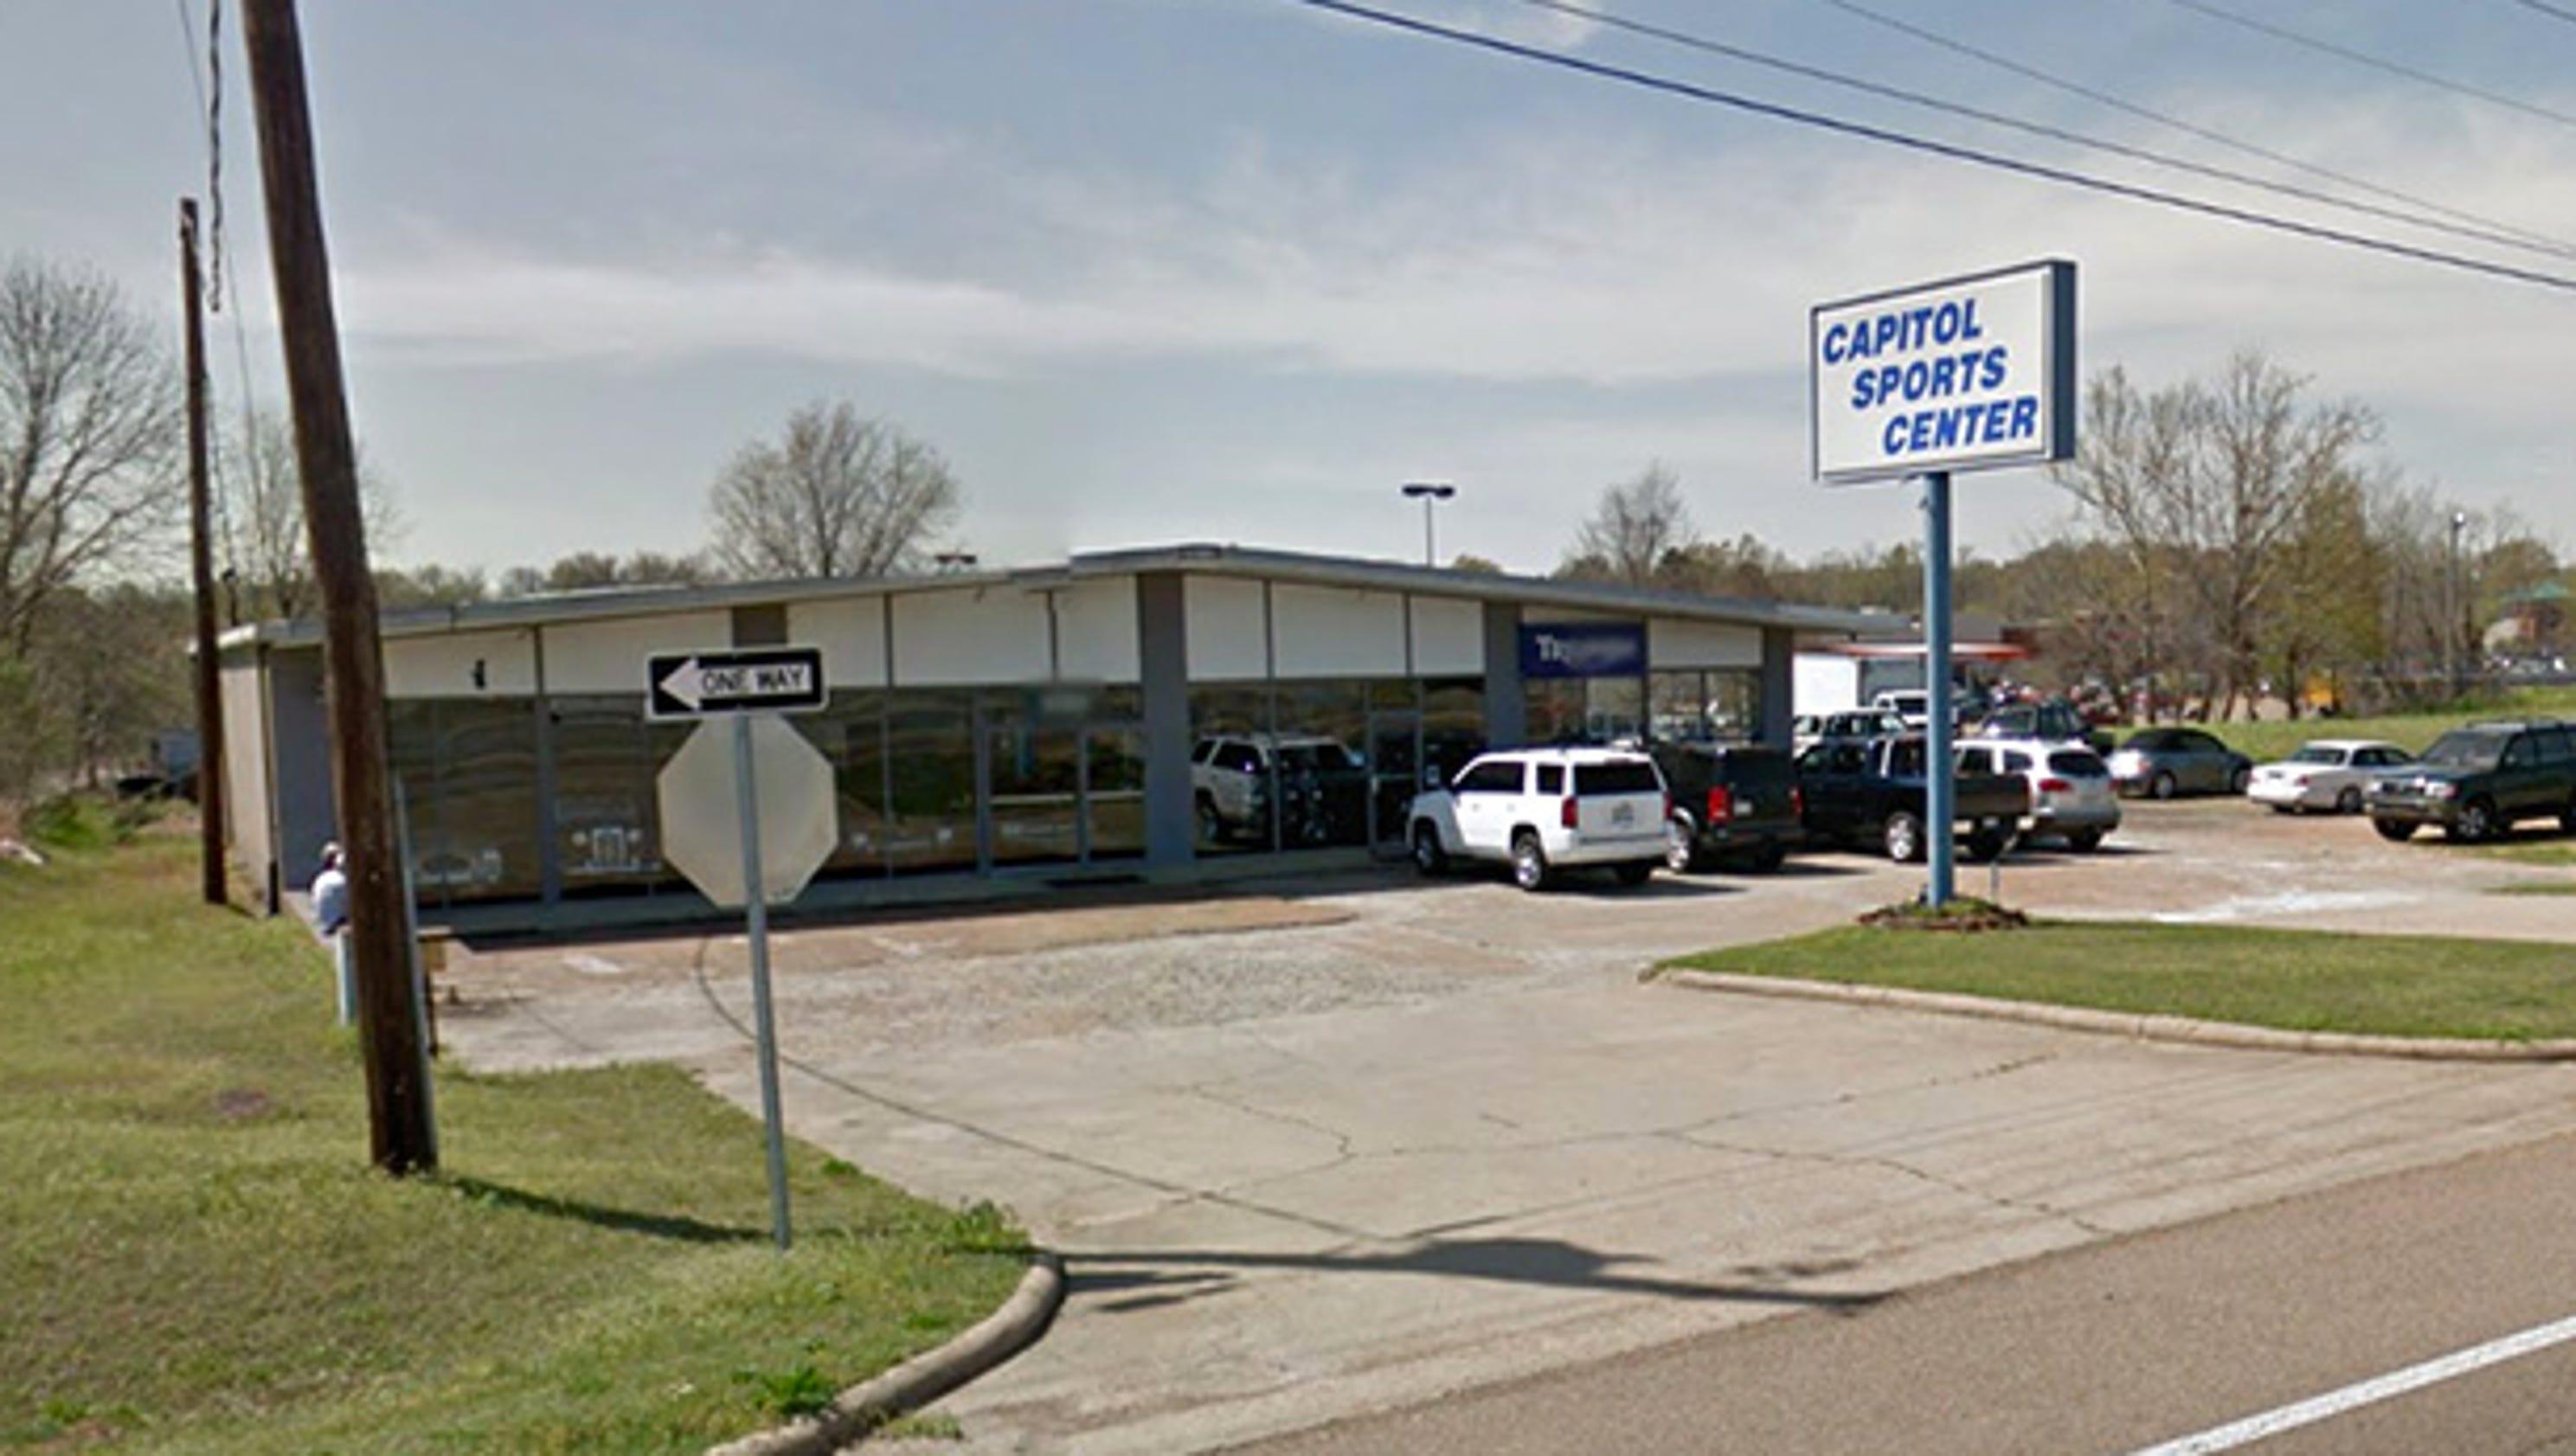 Jackson preowned luxury vehicle dealer seeks transition